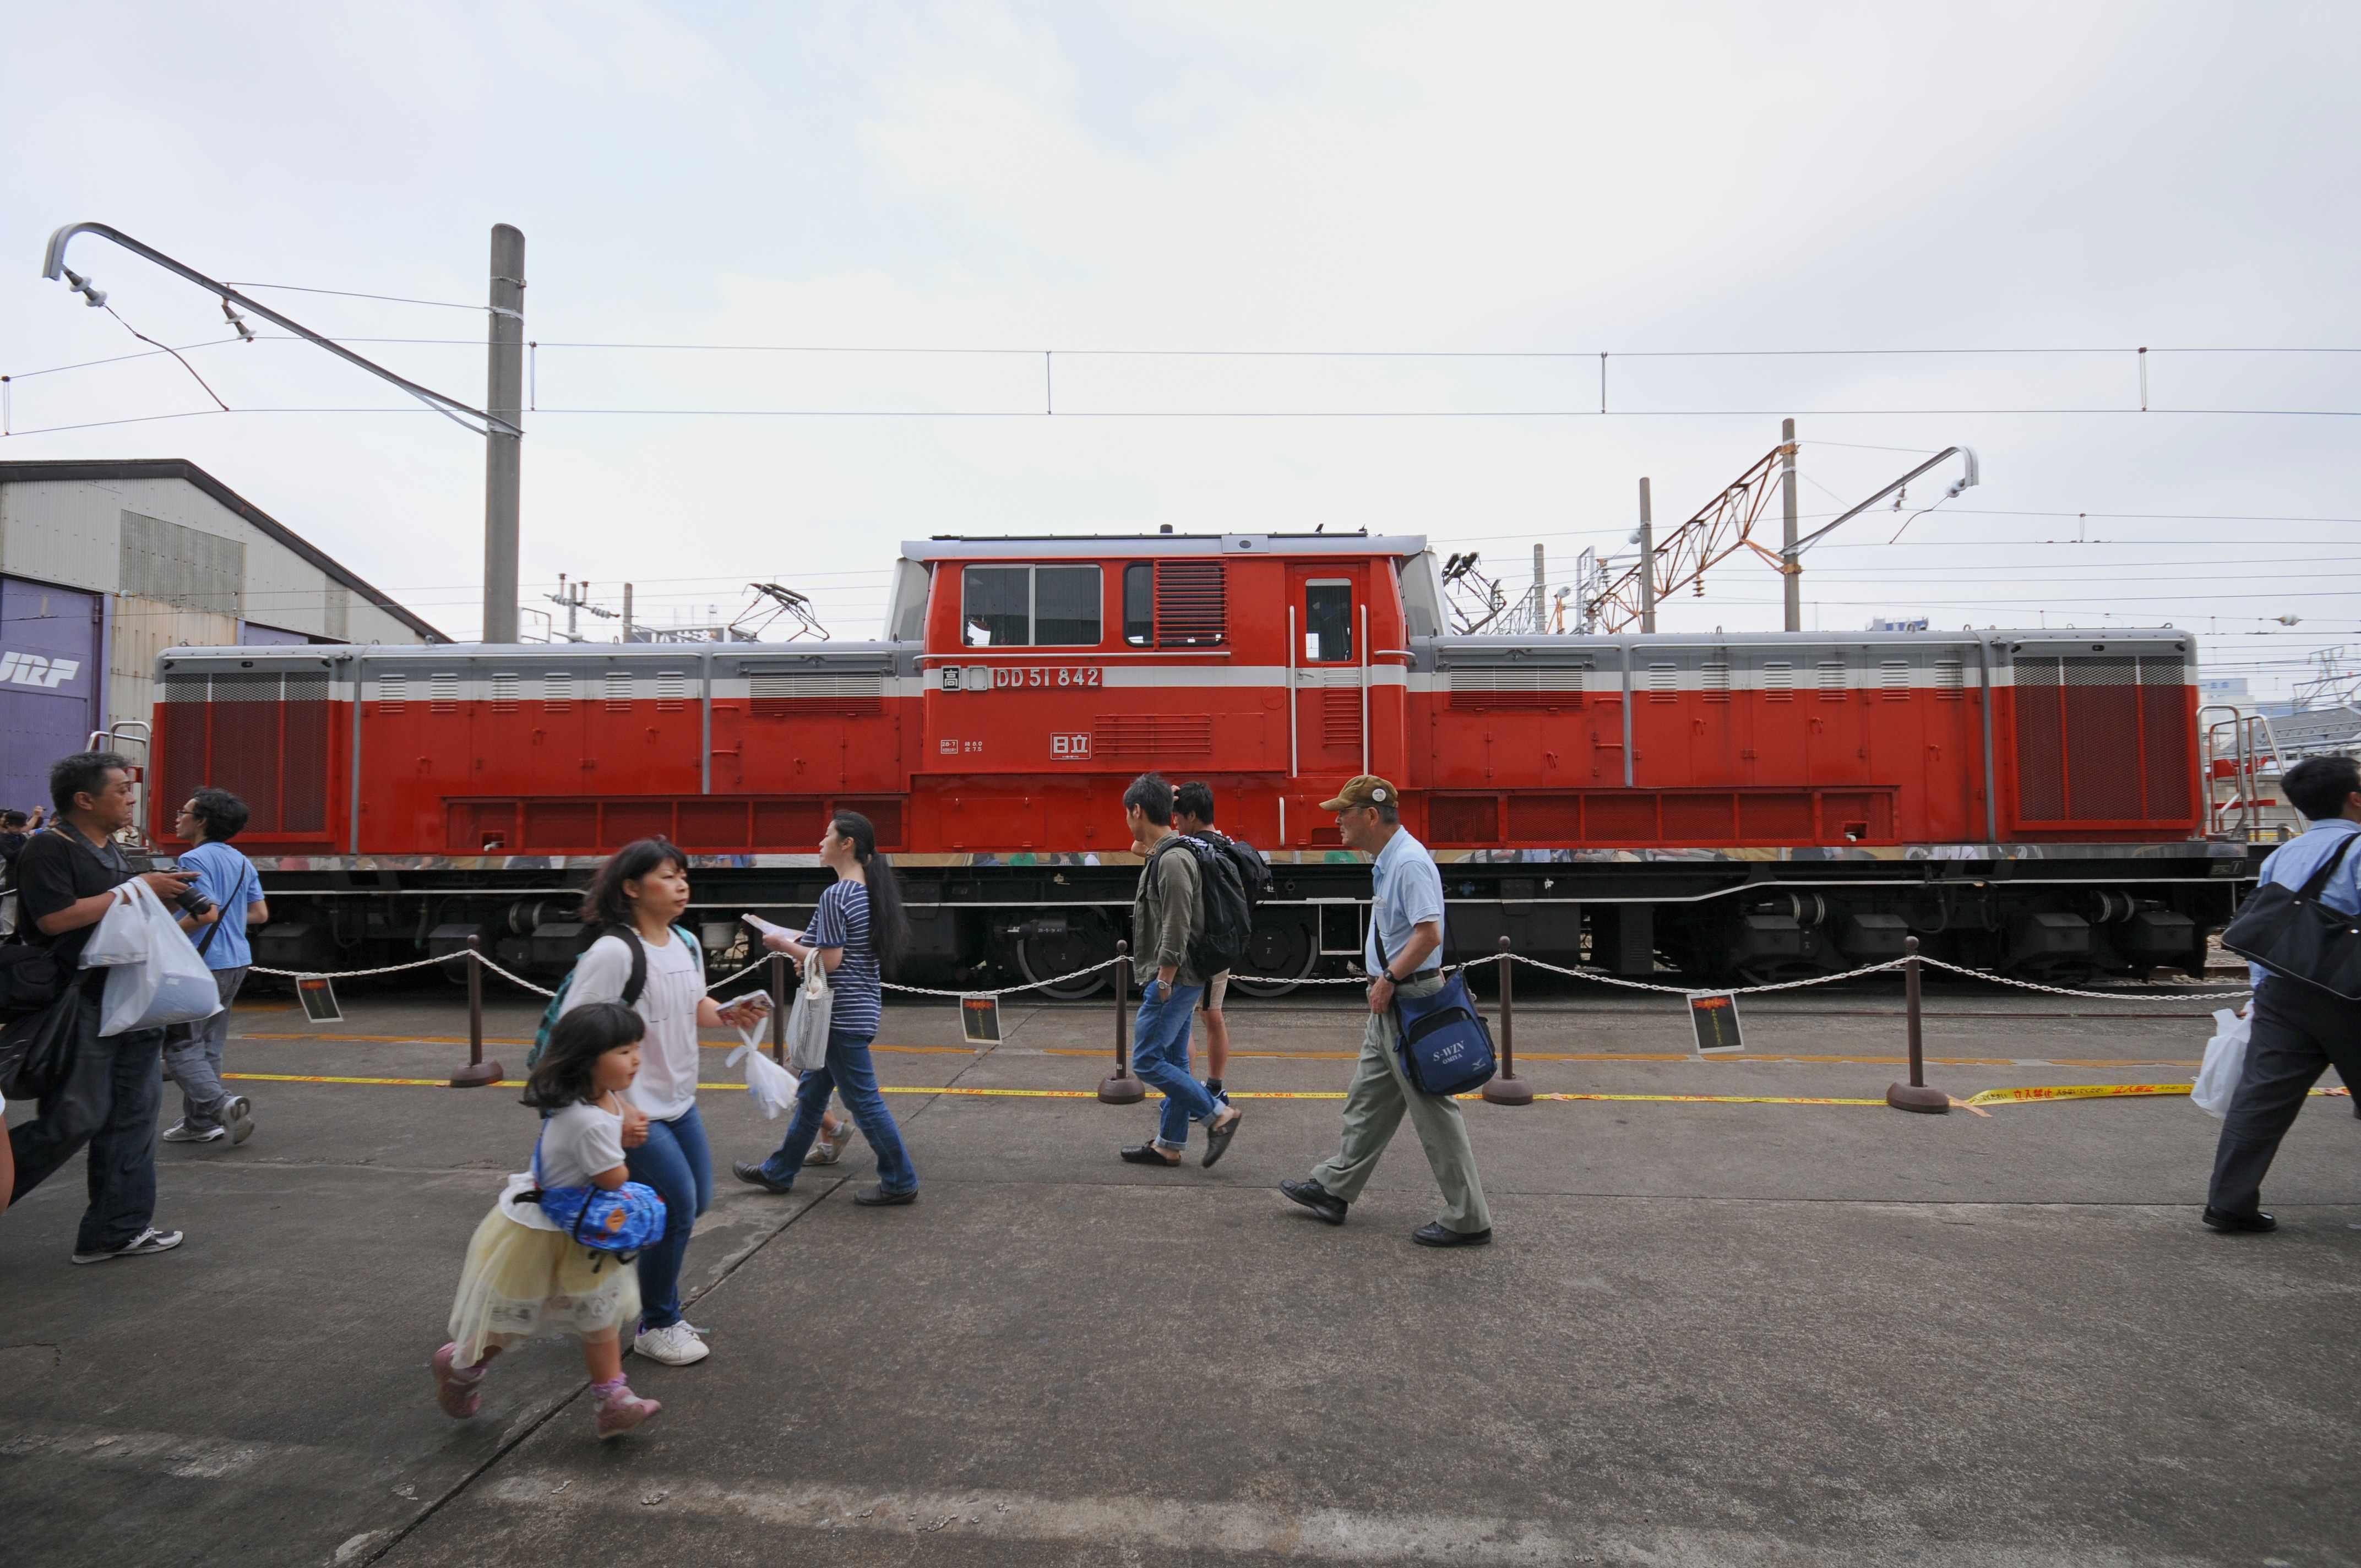 DSC_8941-1.jpg